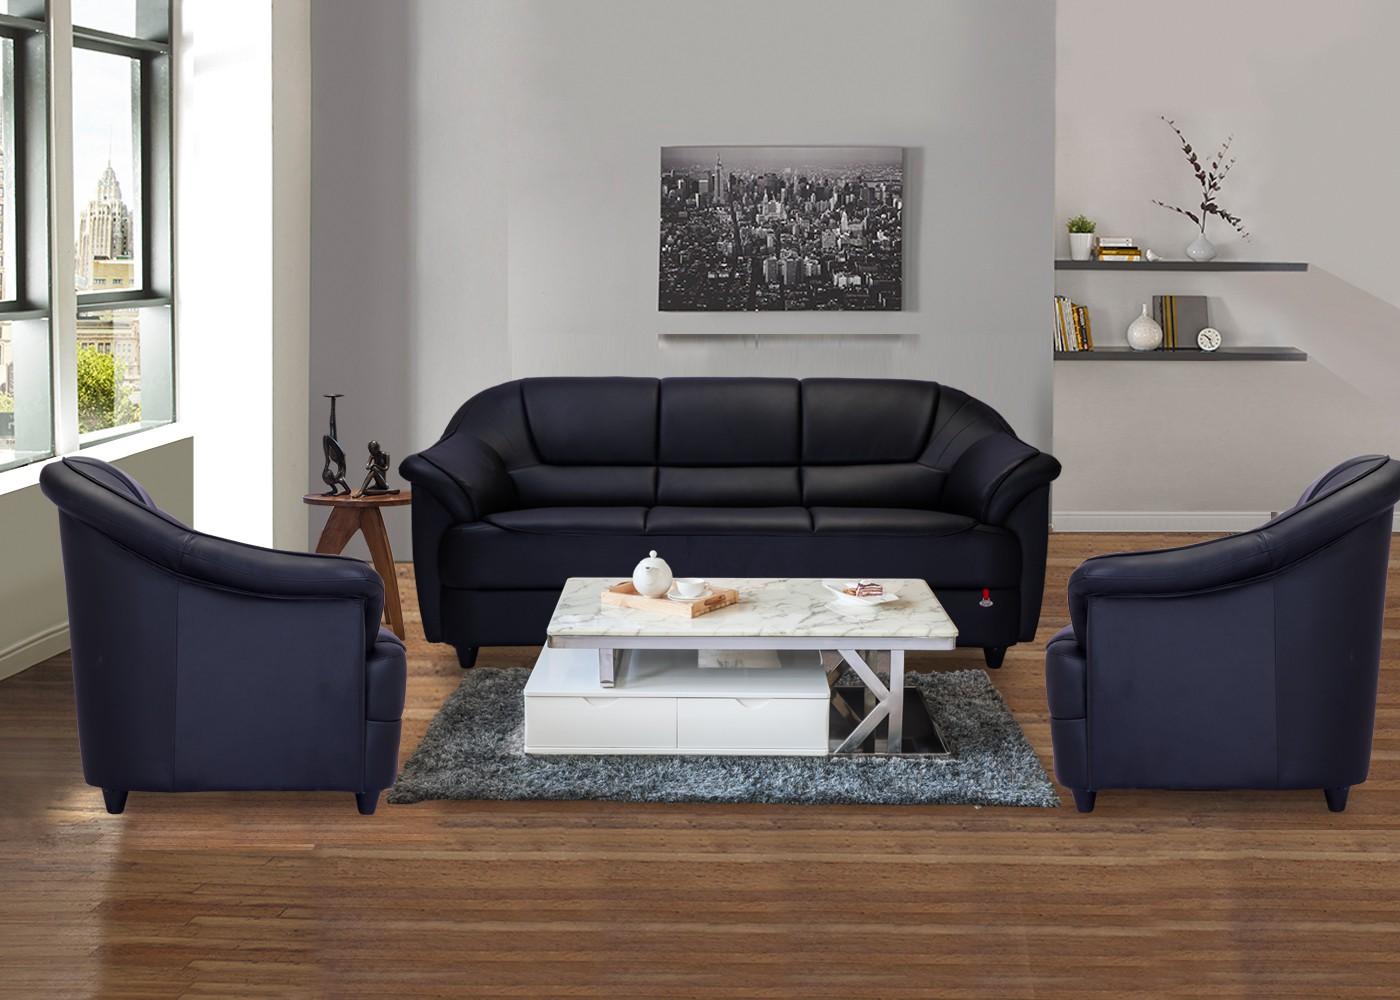 Deals - Bhopal - Min 30% Off <br> Durian<br> Category - furniture<br> Business - Flipkart.com